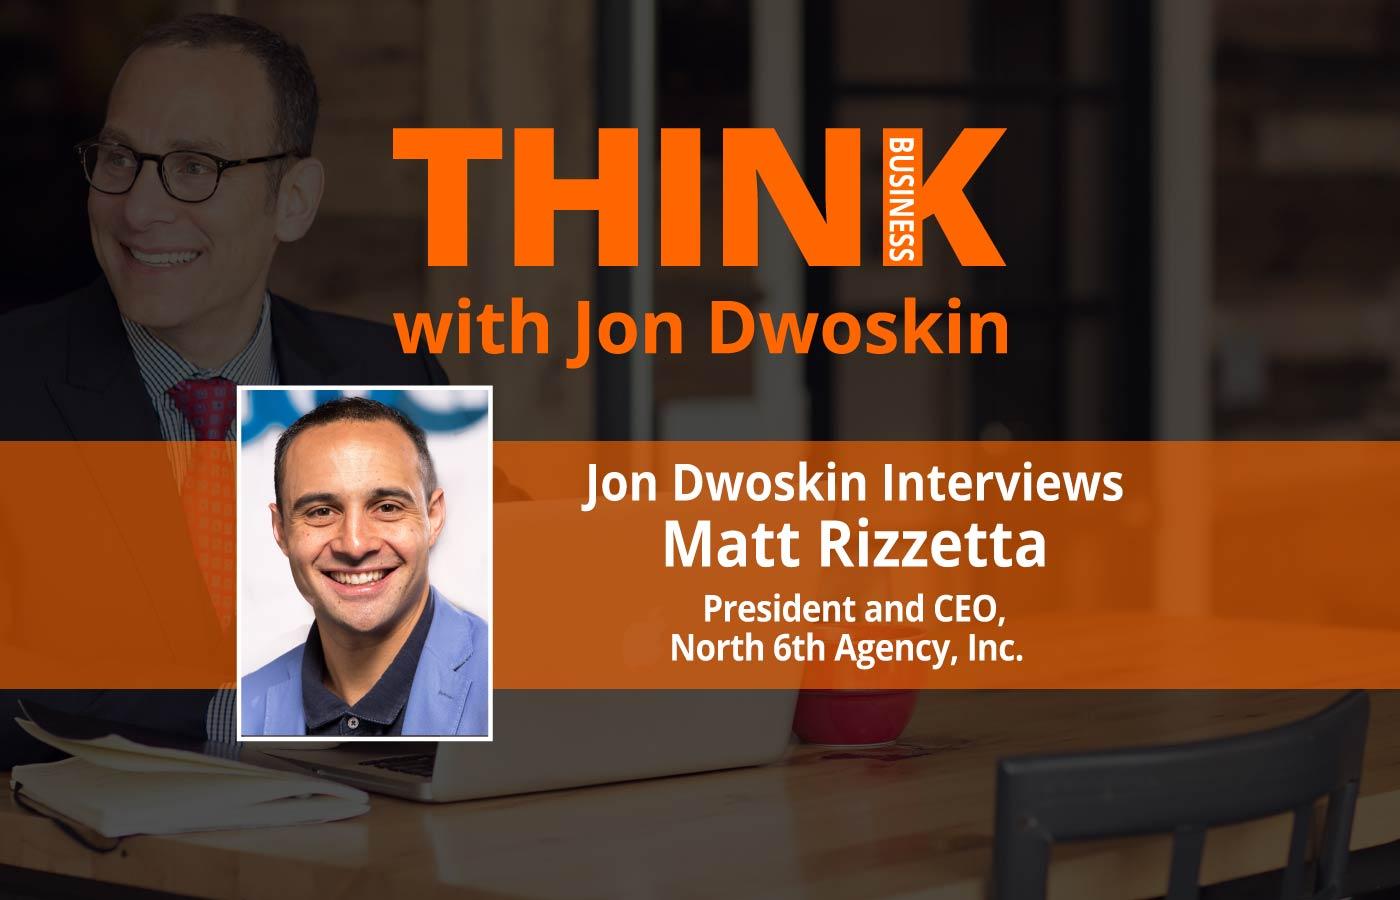 THINK Business: Jon Dwoskin Interviews Matt Rizzetta, President and CEO of North 6th Agency, Inc.